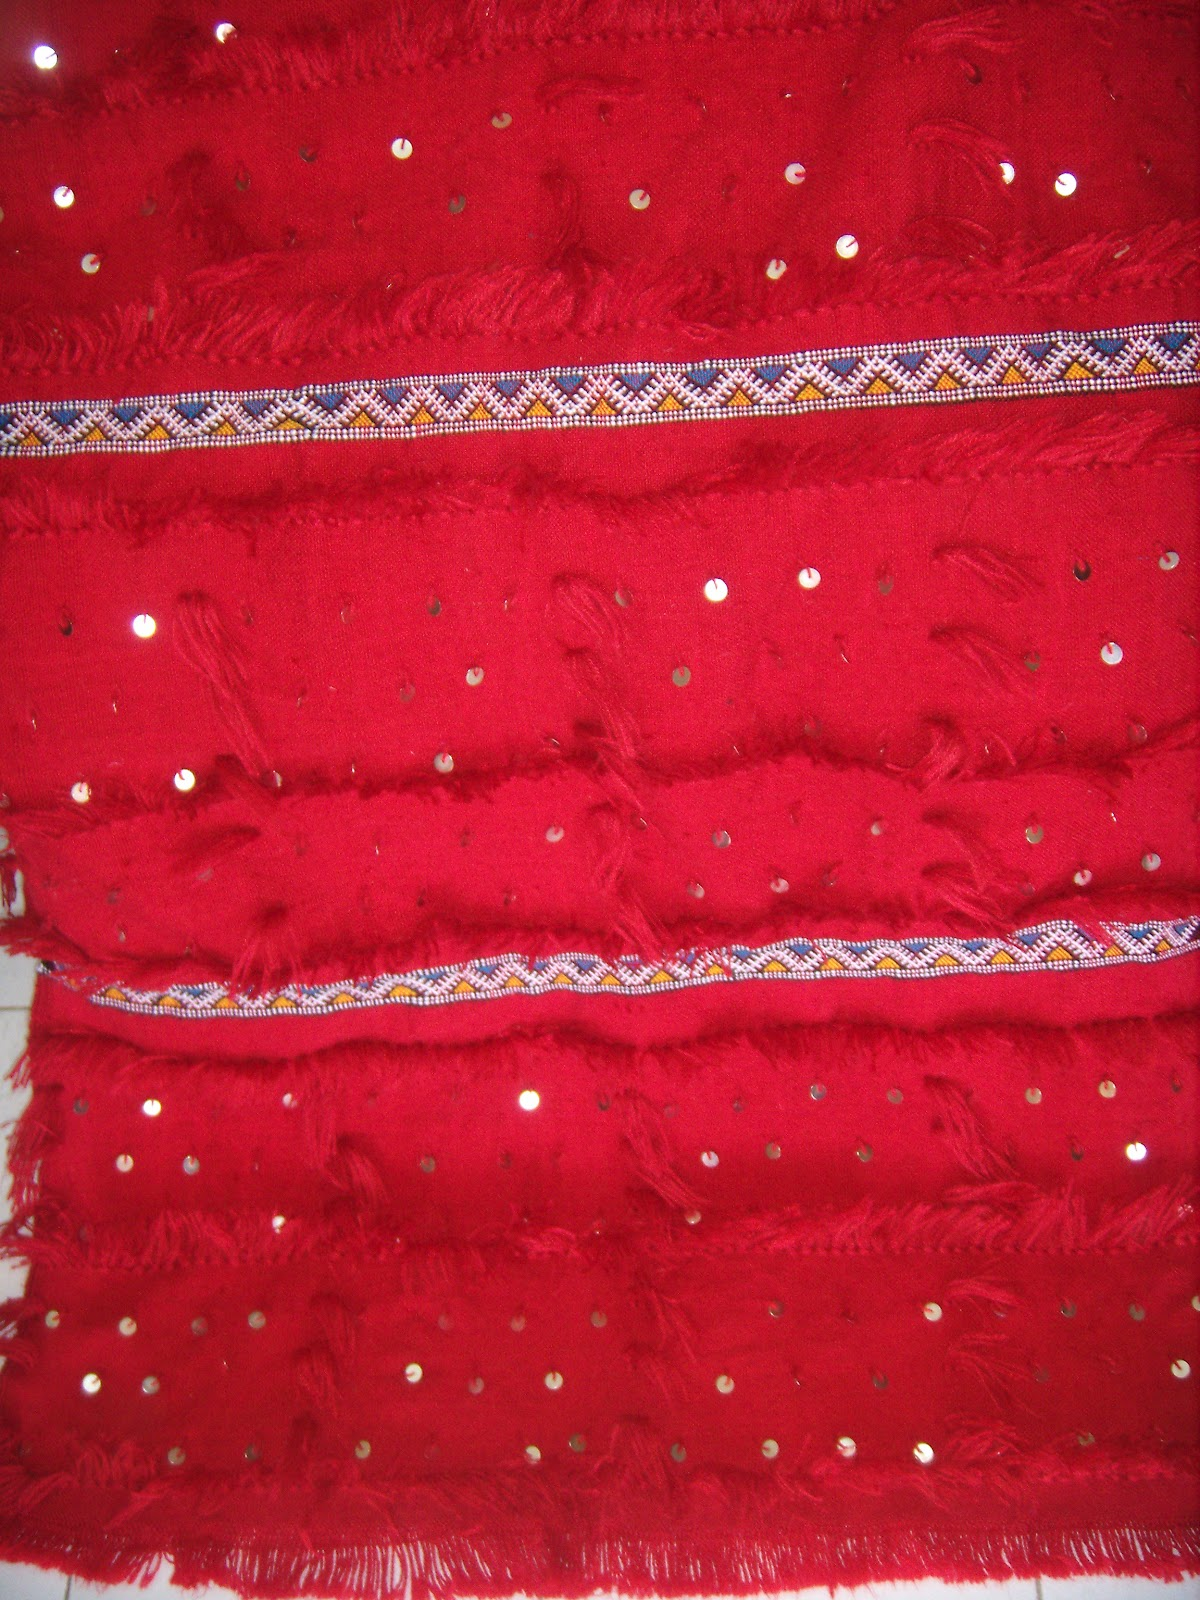 merycarpet handira rouge jet de canap. Black Bedroom Furniture Sets. Home Design Ideas